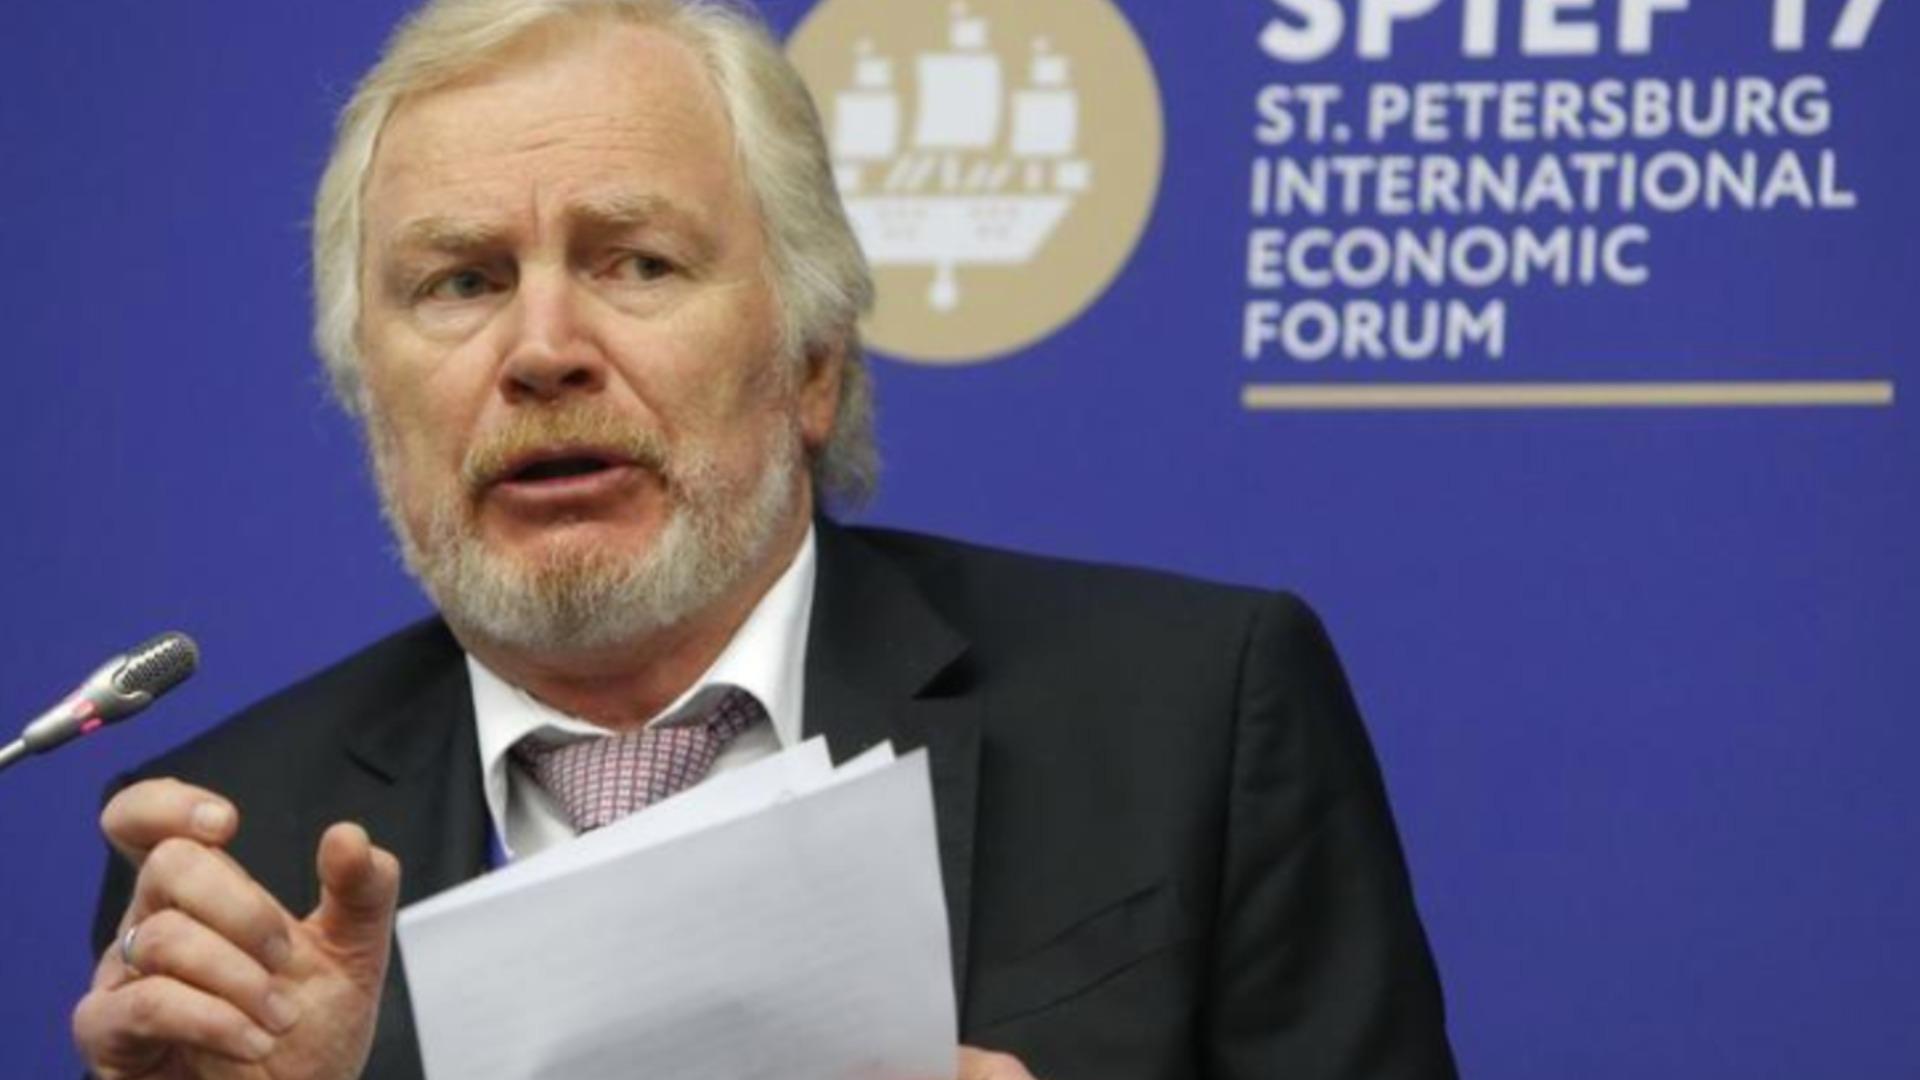 Rusia podría enviar asesores económicos a Venezuela